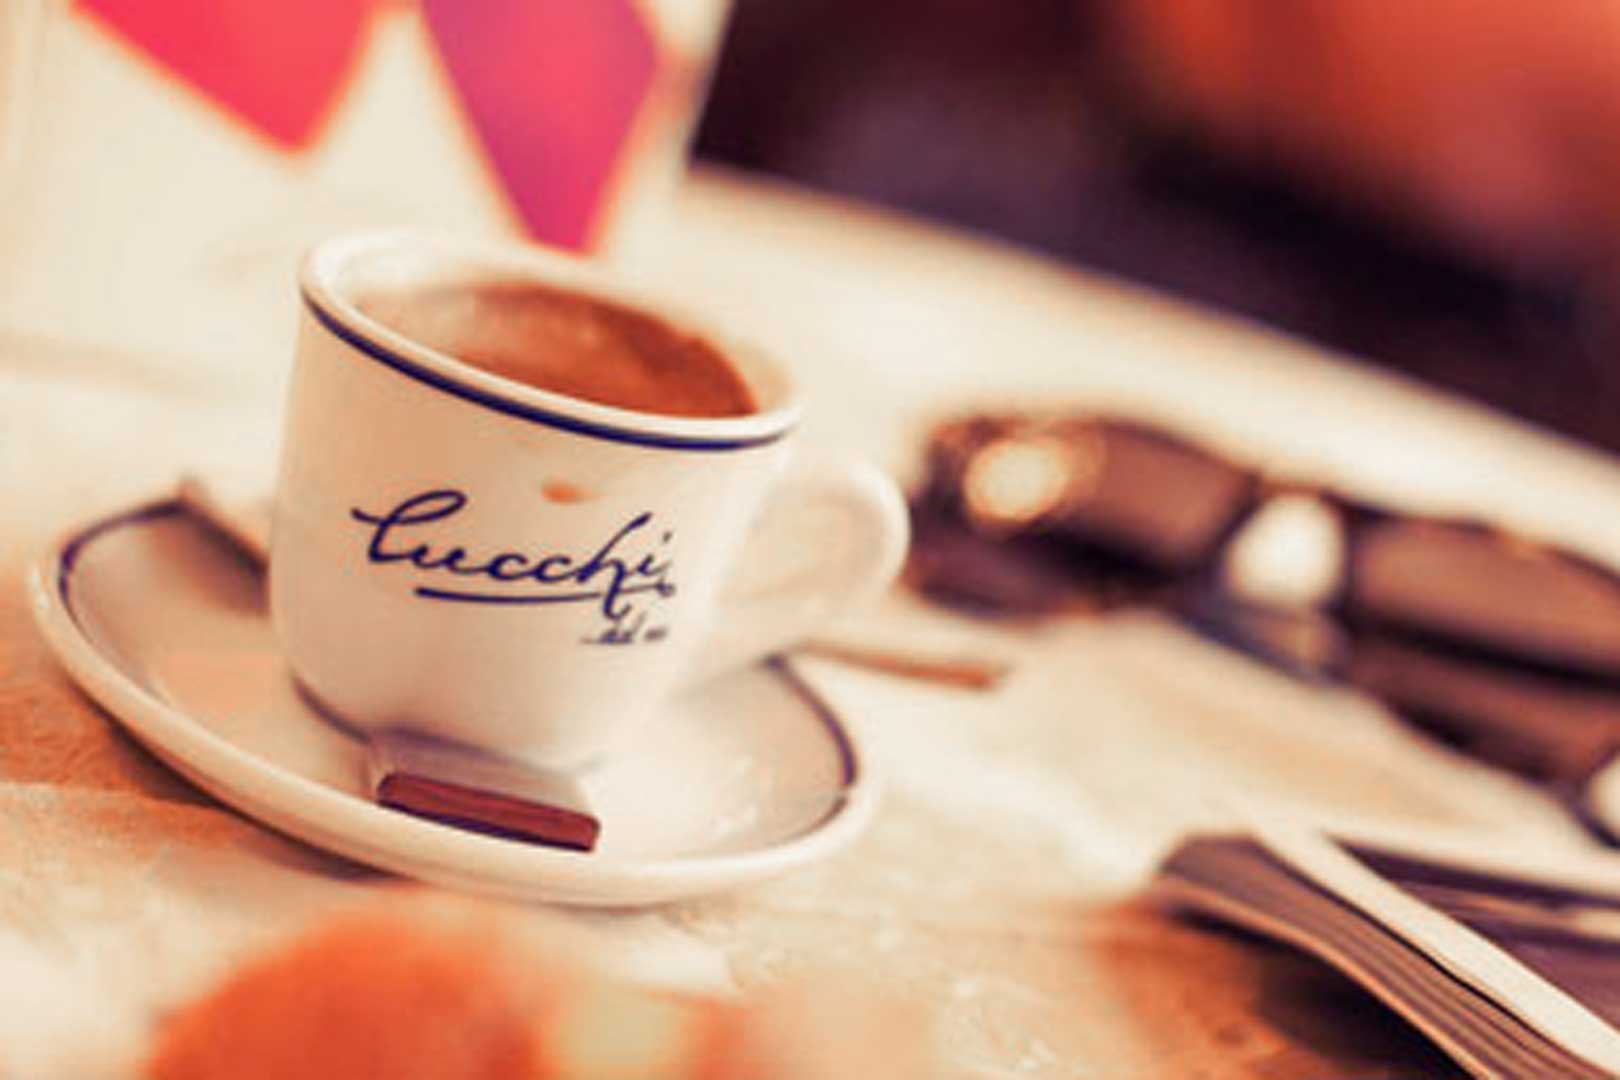 pasticceria-cucchi-caffe